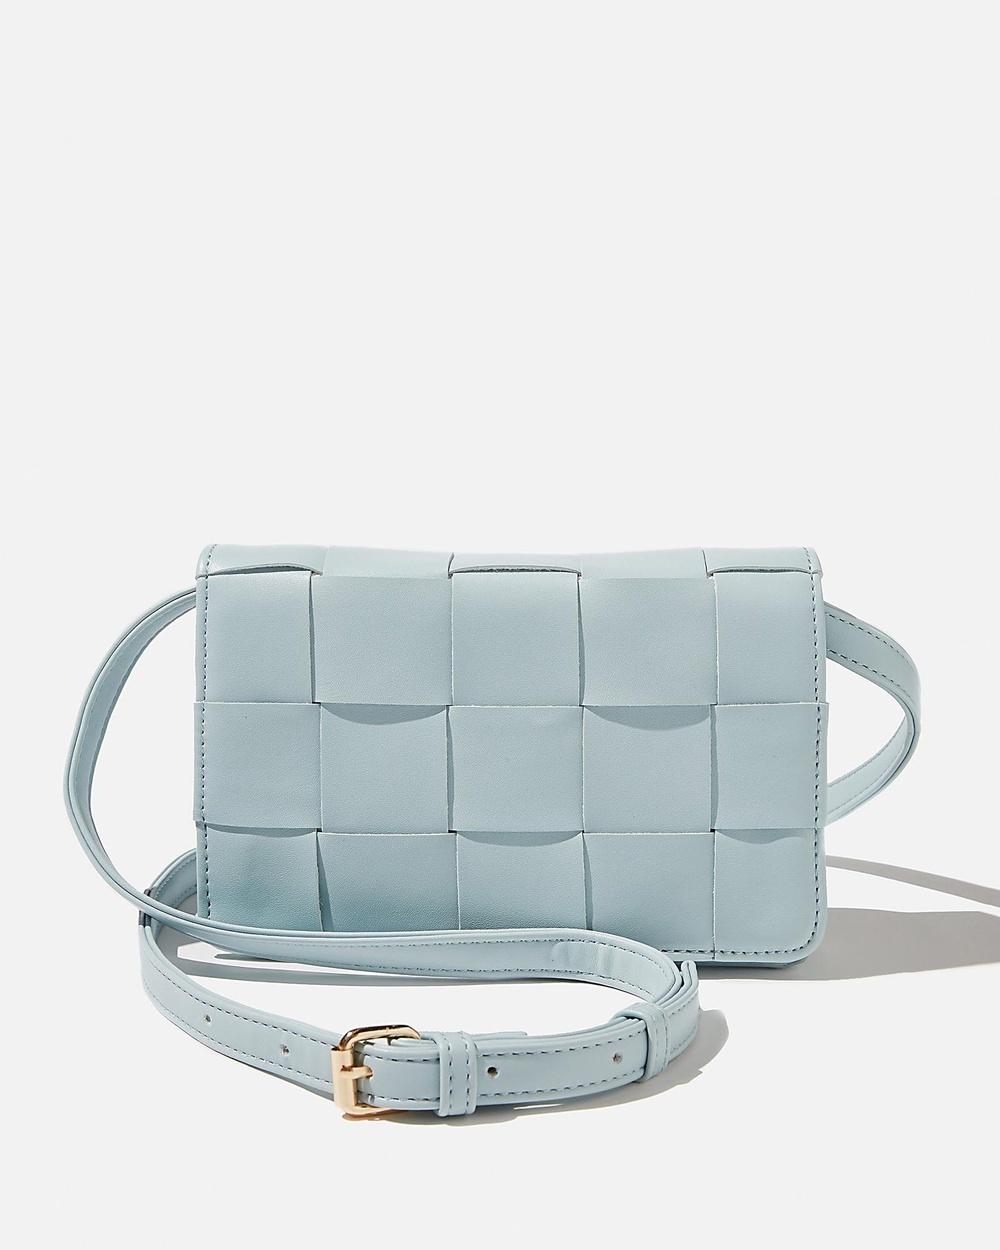 Rubi Christy Woven Cross Body Bag Handbags Illusion Blue Cross-Body